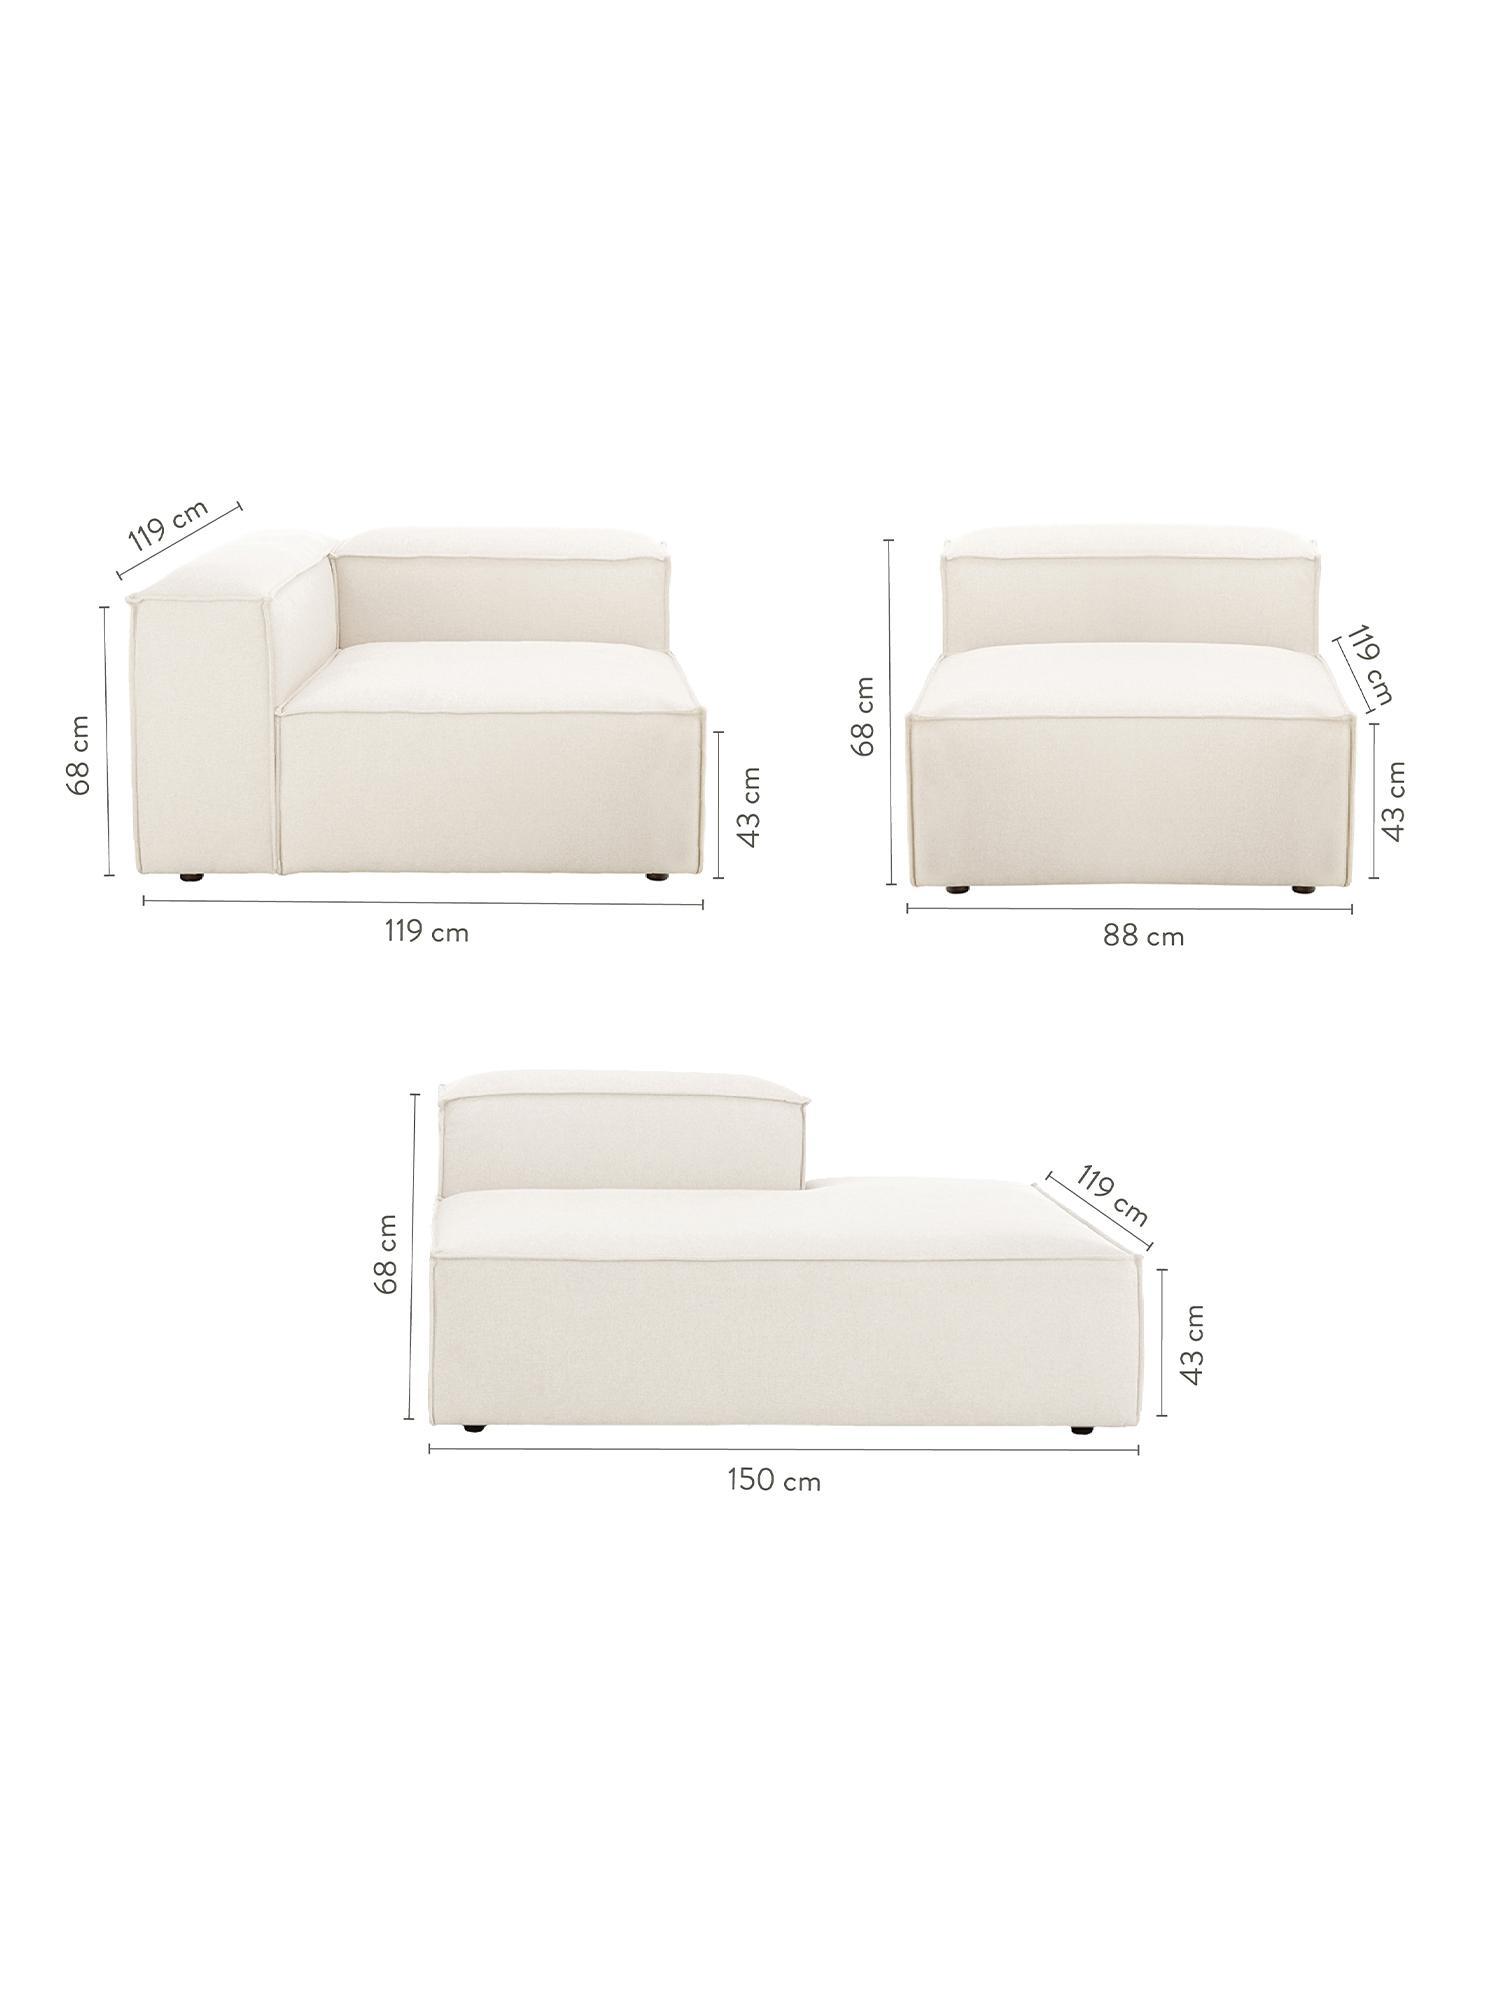 Canapé modulable XL dossier bas Lennon, Tissu beige